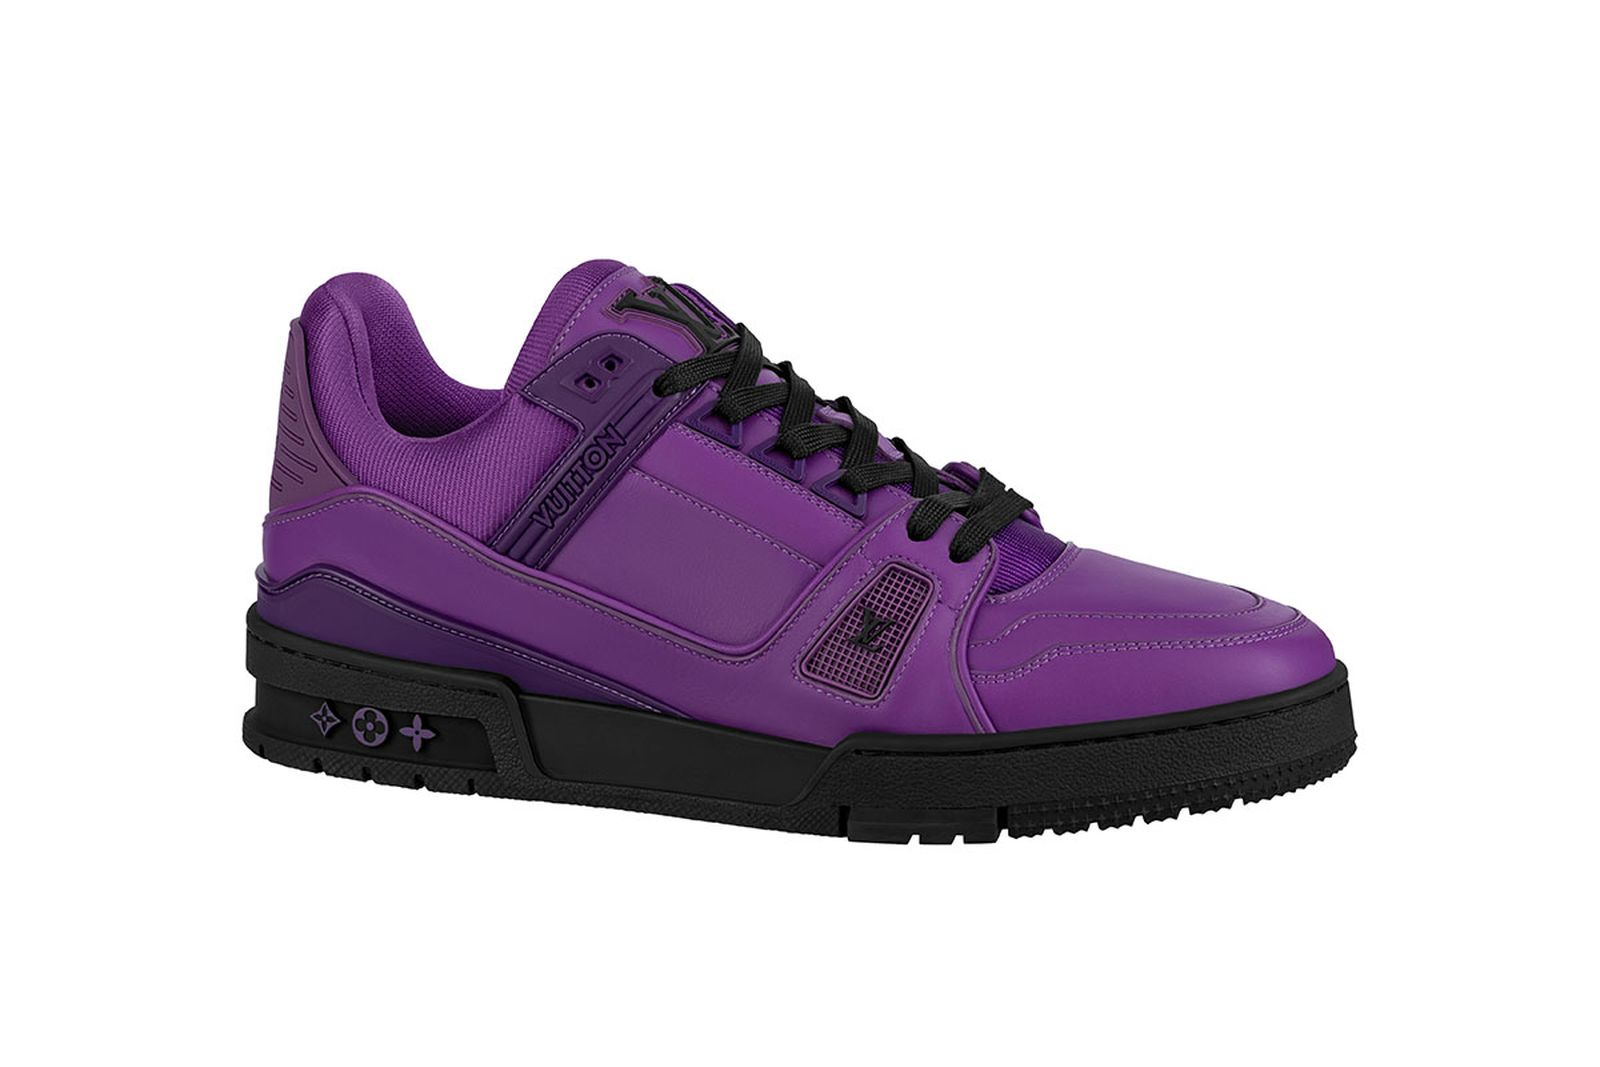 louis-vuitton-rainbow-outerwear-footwear-05